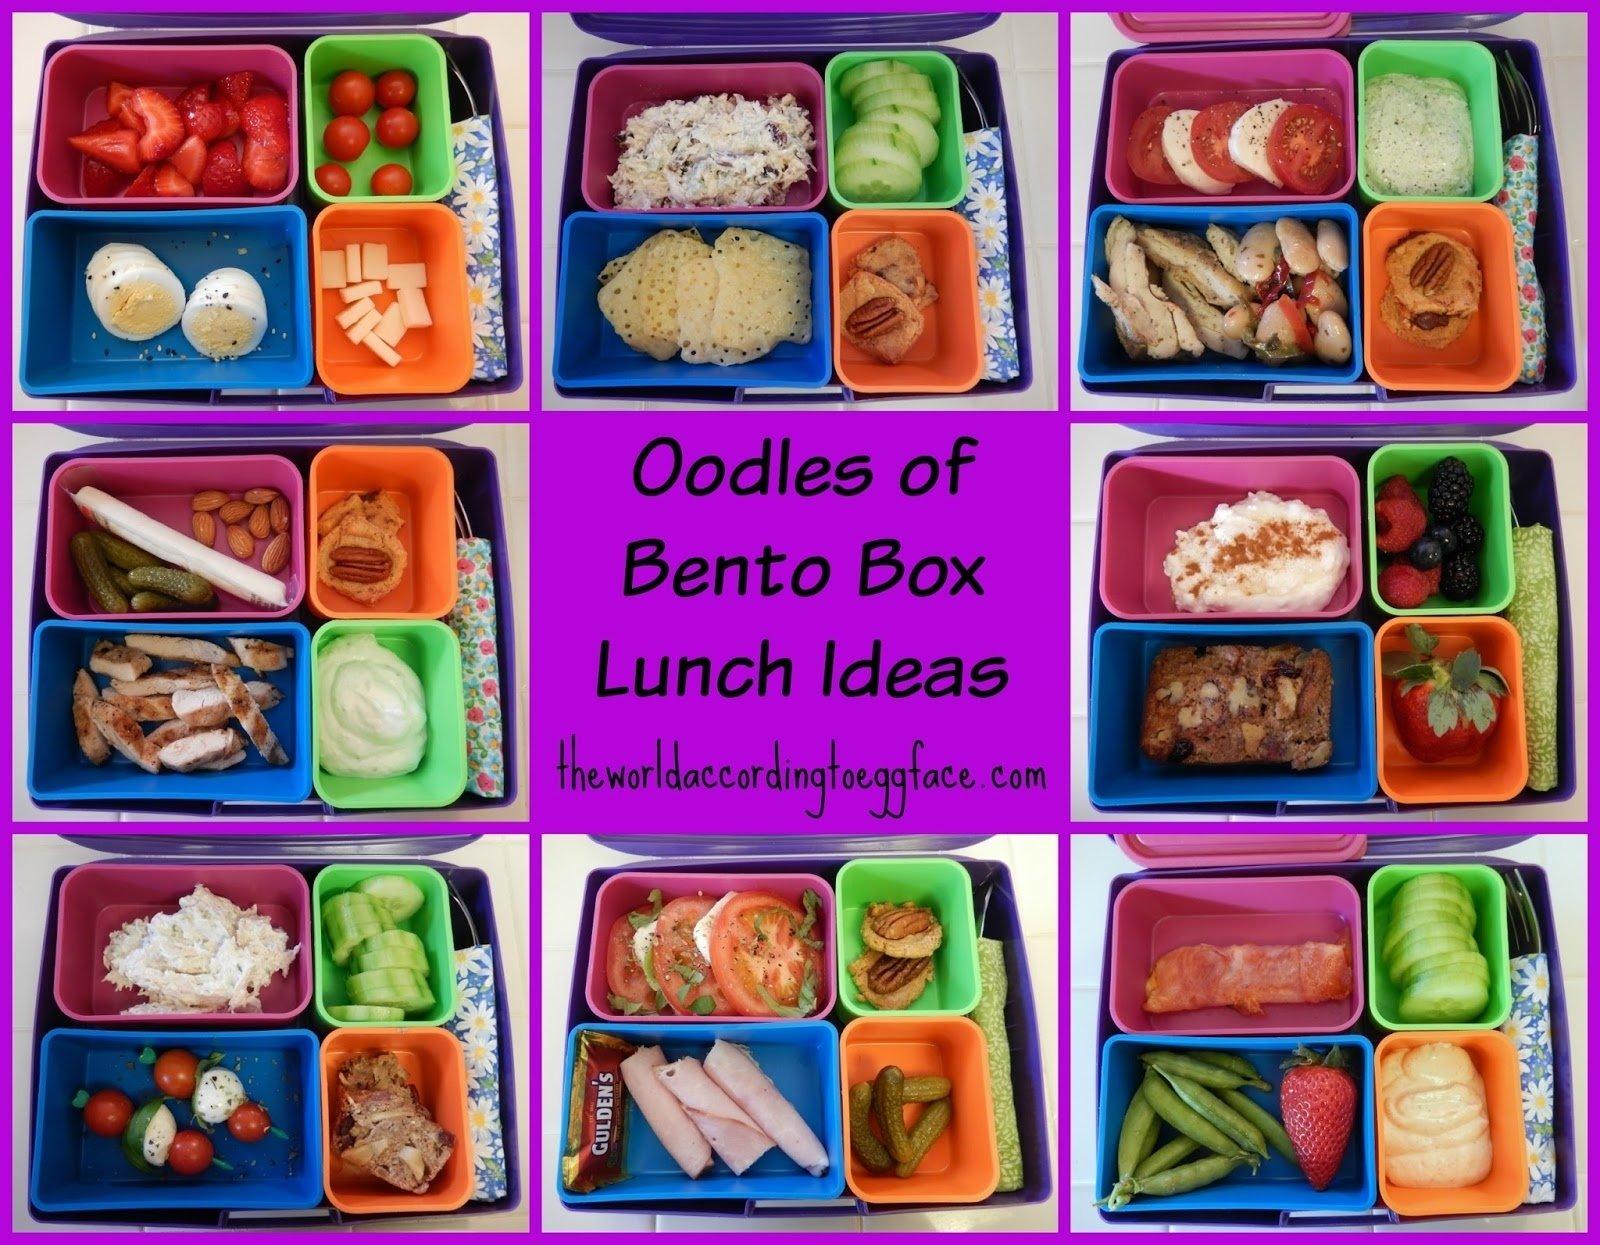 10 Elegant Healthy Bento Box Lunch Ideas theworldaccordingtoeggface oodles of healthy bento box lunch ideas 2021